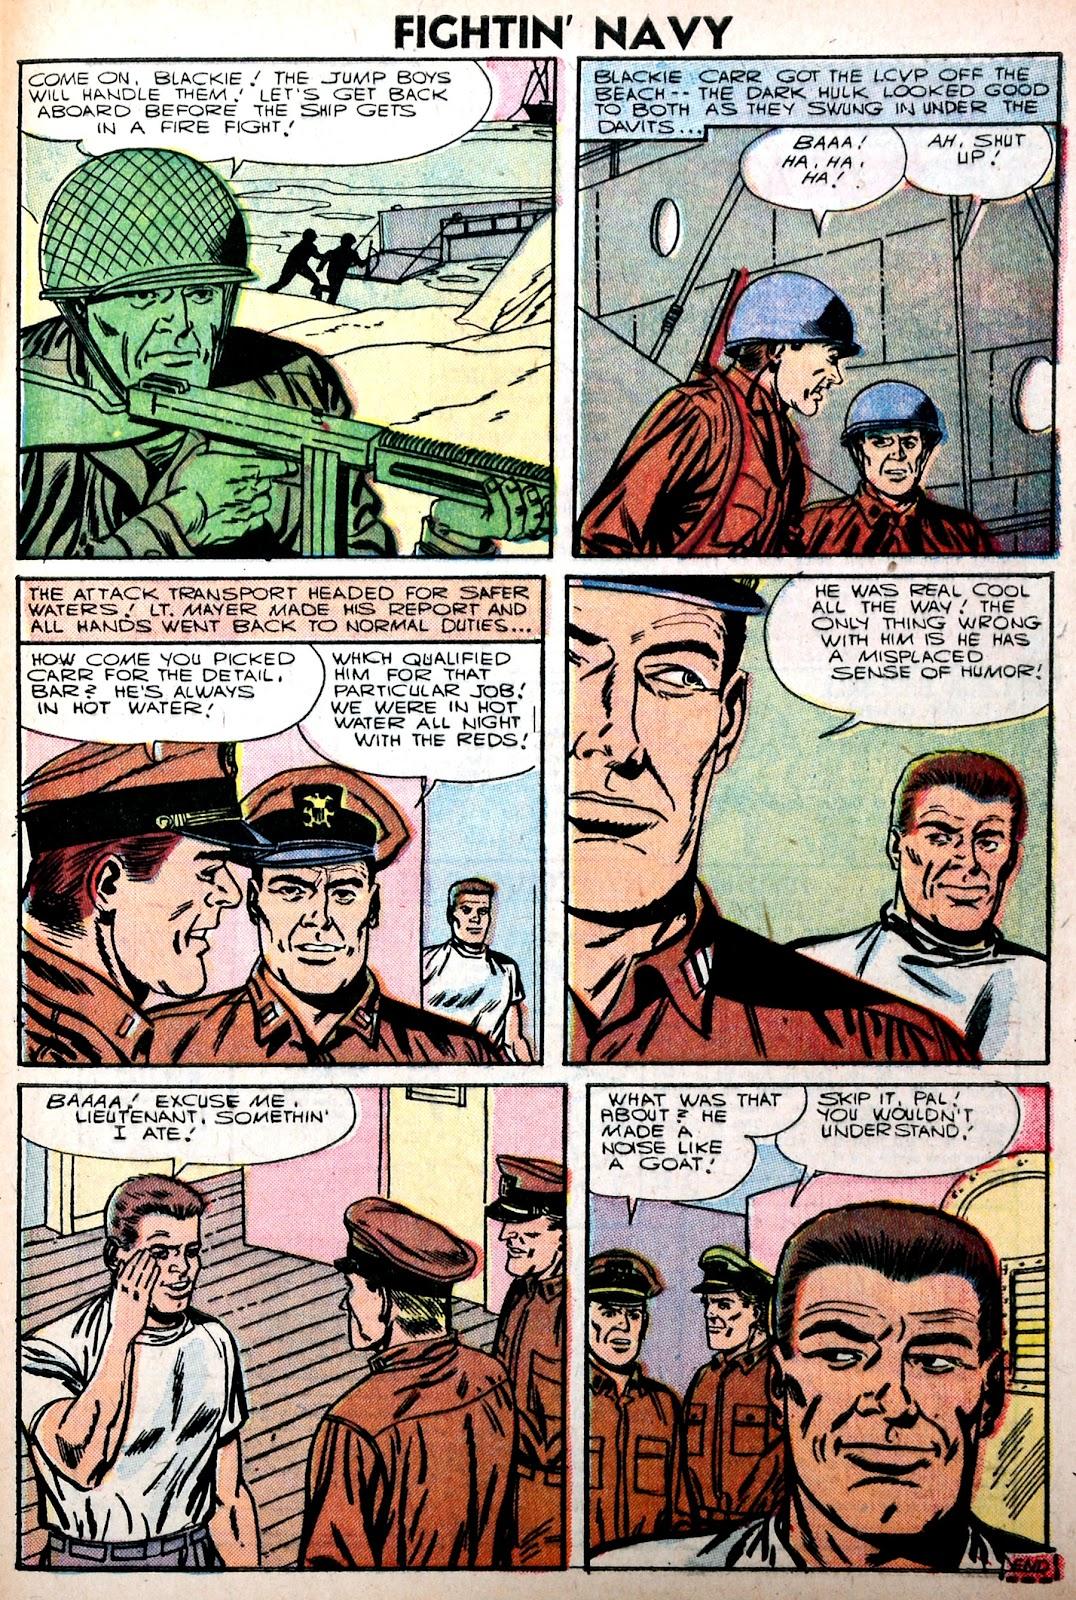 Read online Fightin' Navy comic -  Issue #75 - 33